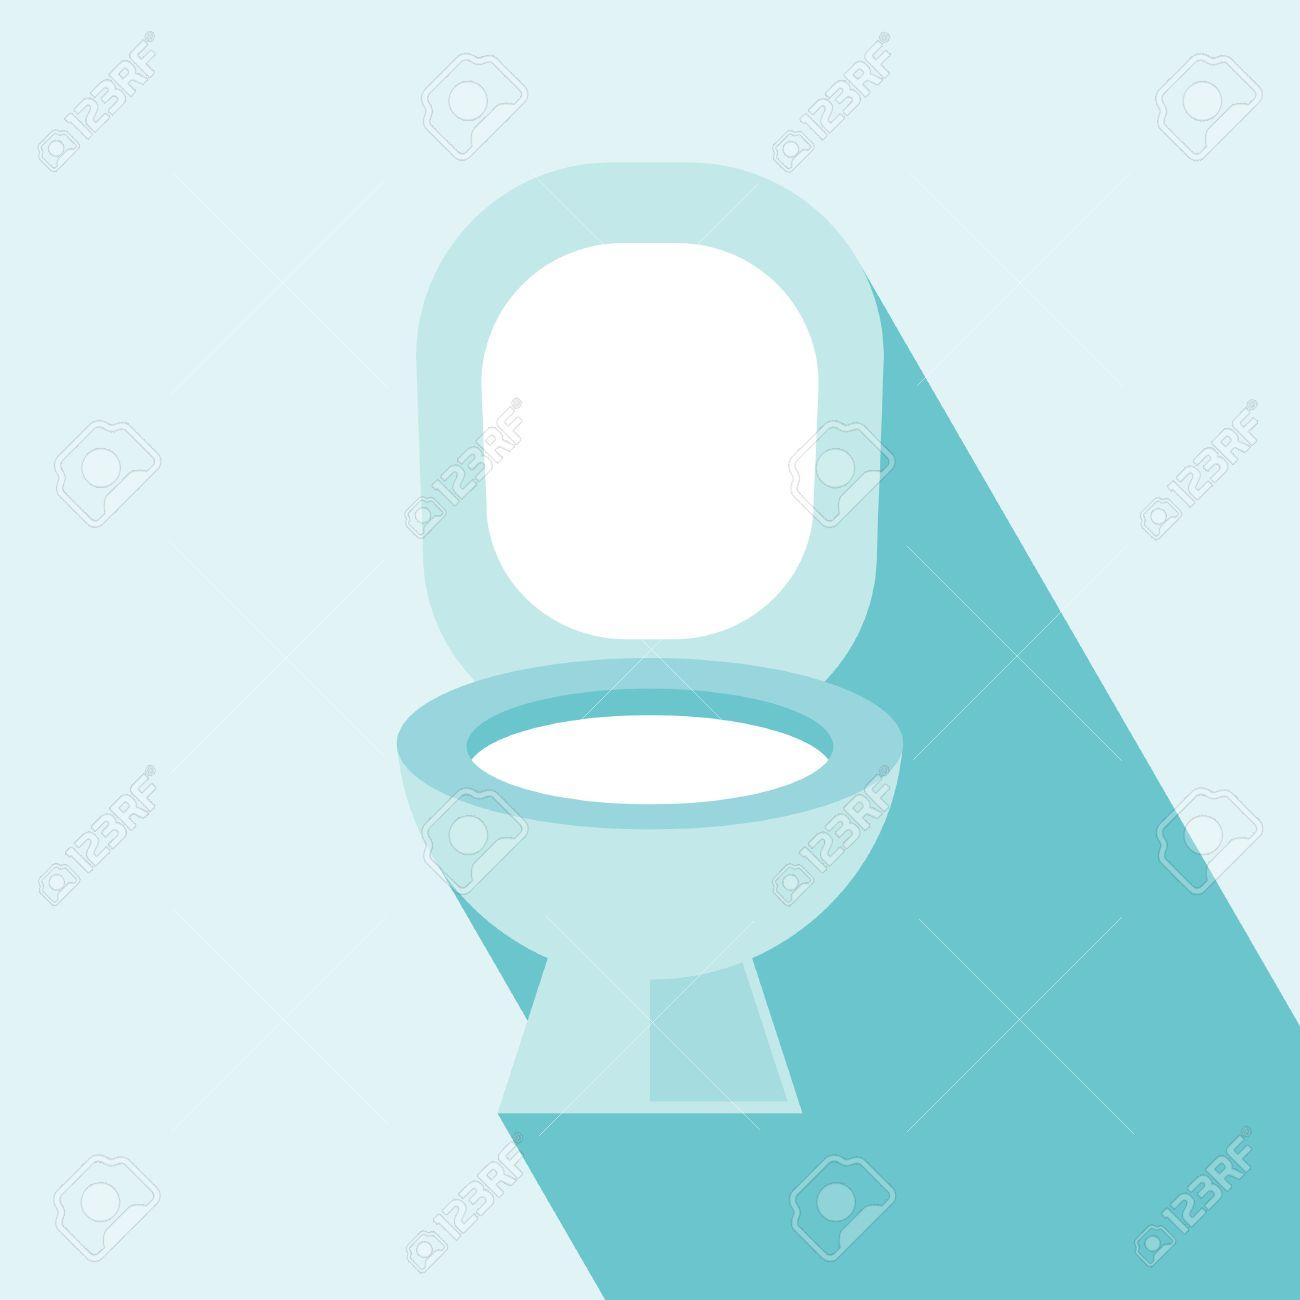 Flush Toilet Icon Wc ,Toilet sign,vector Flush Toilet Icon on light blue Background Elements for design - 29708822